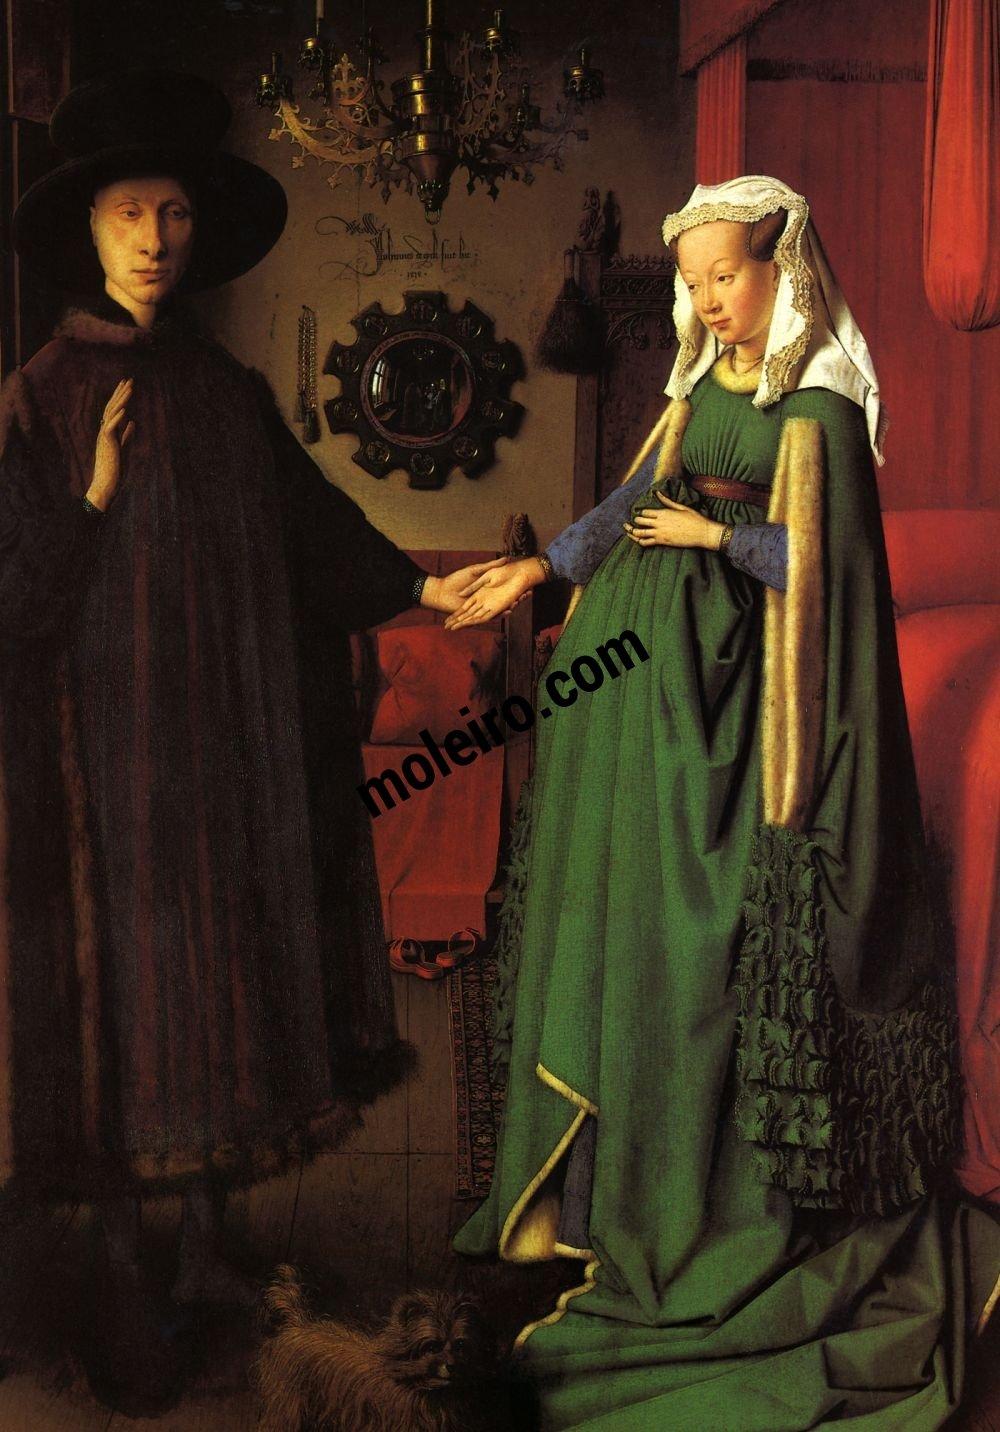 Jan Van Eyck, The Arnolfini Portrait, 1434.